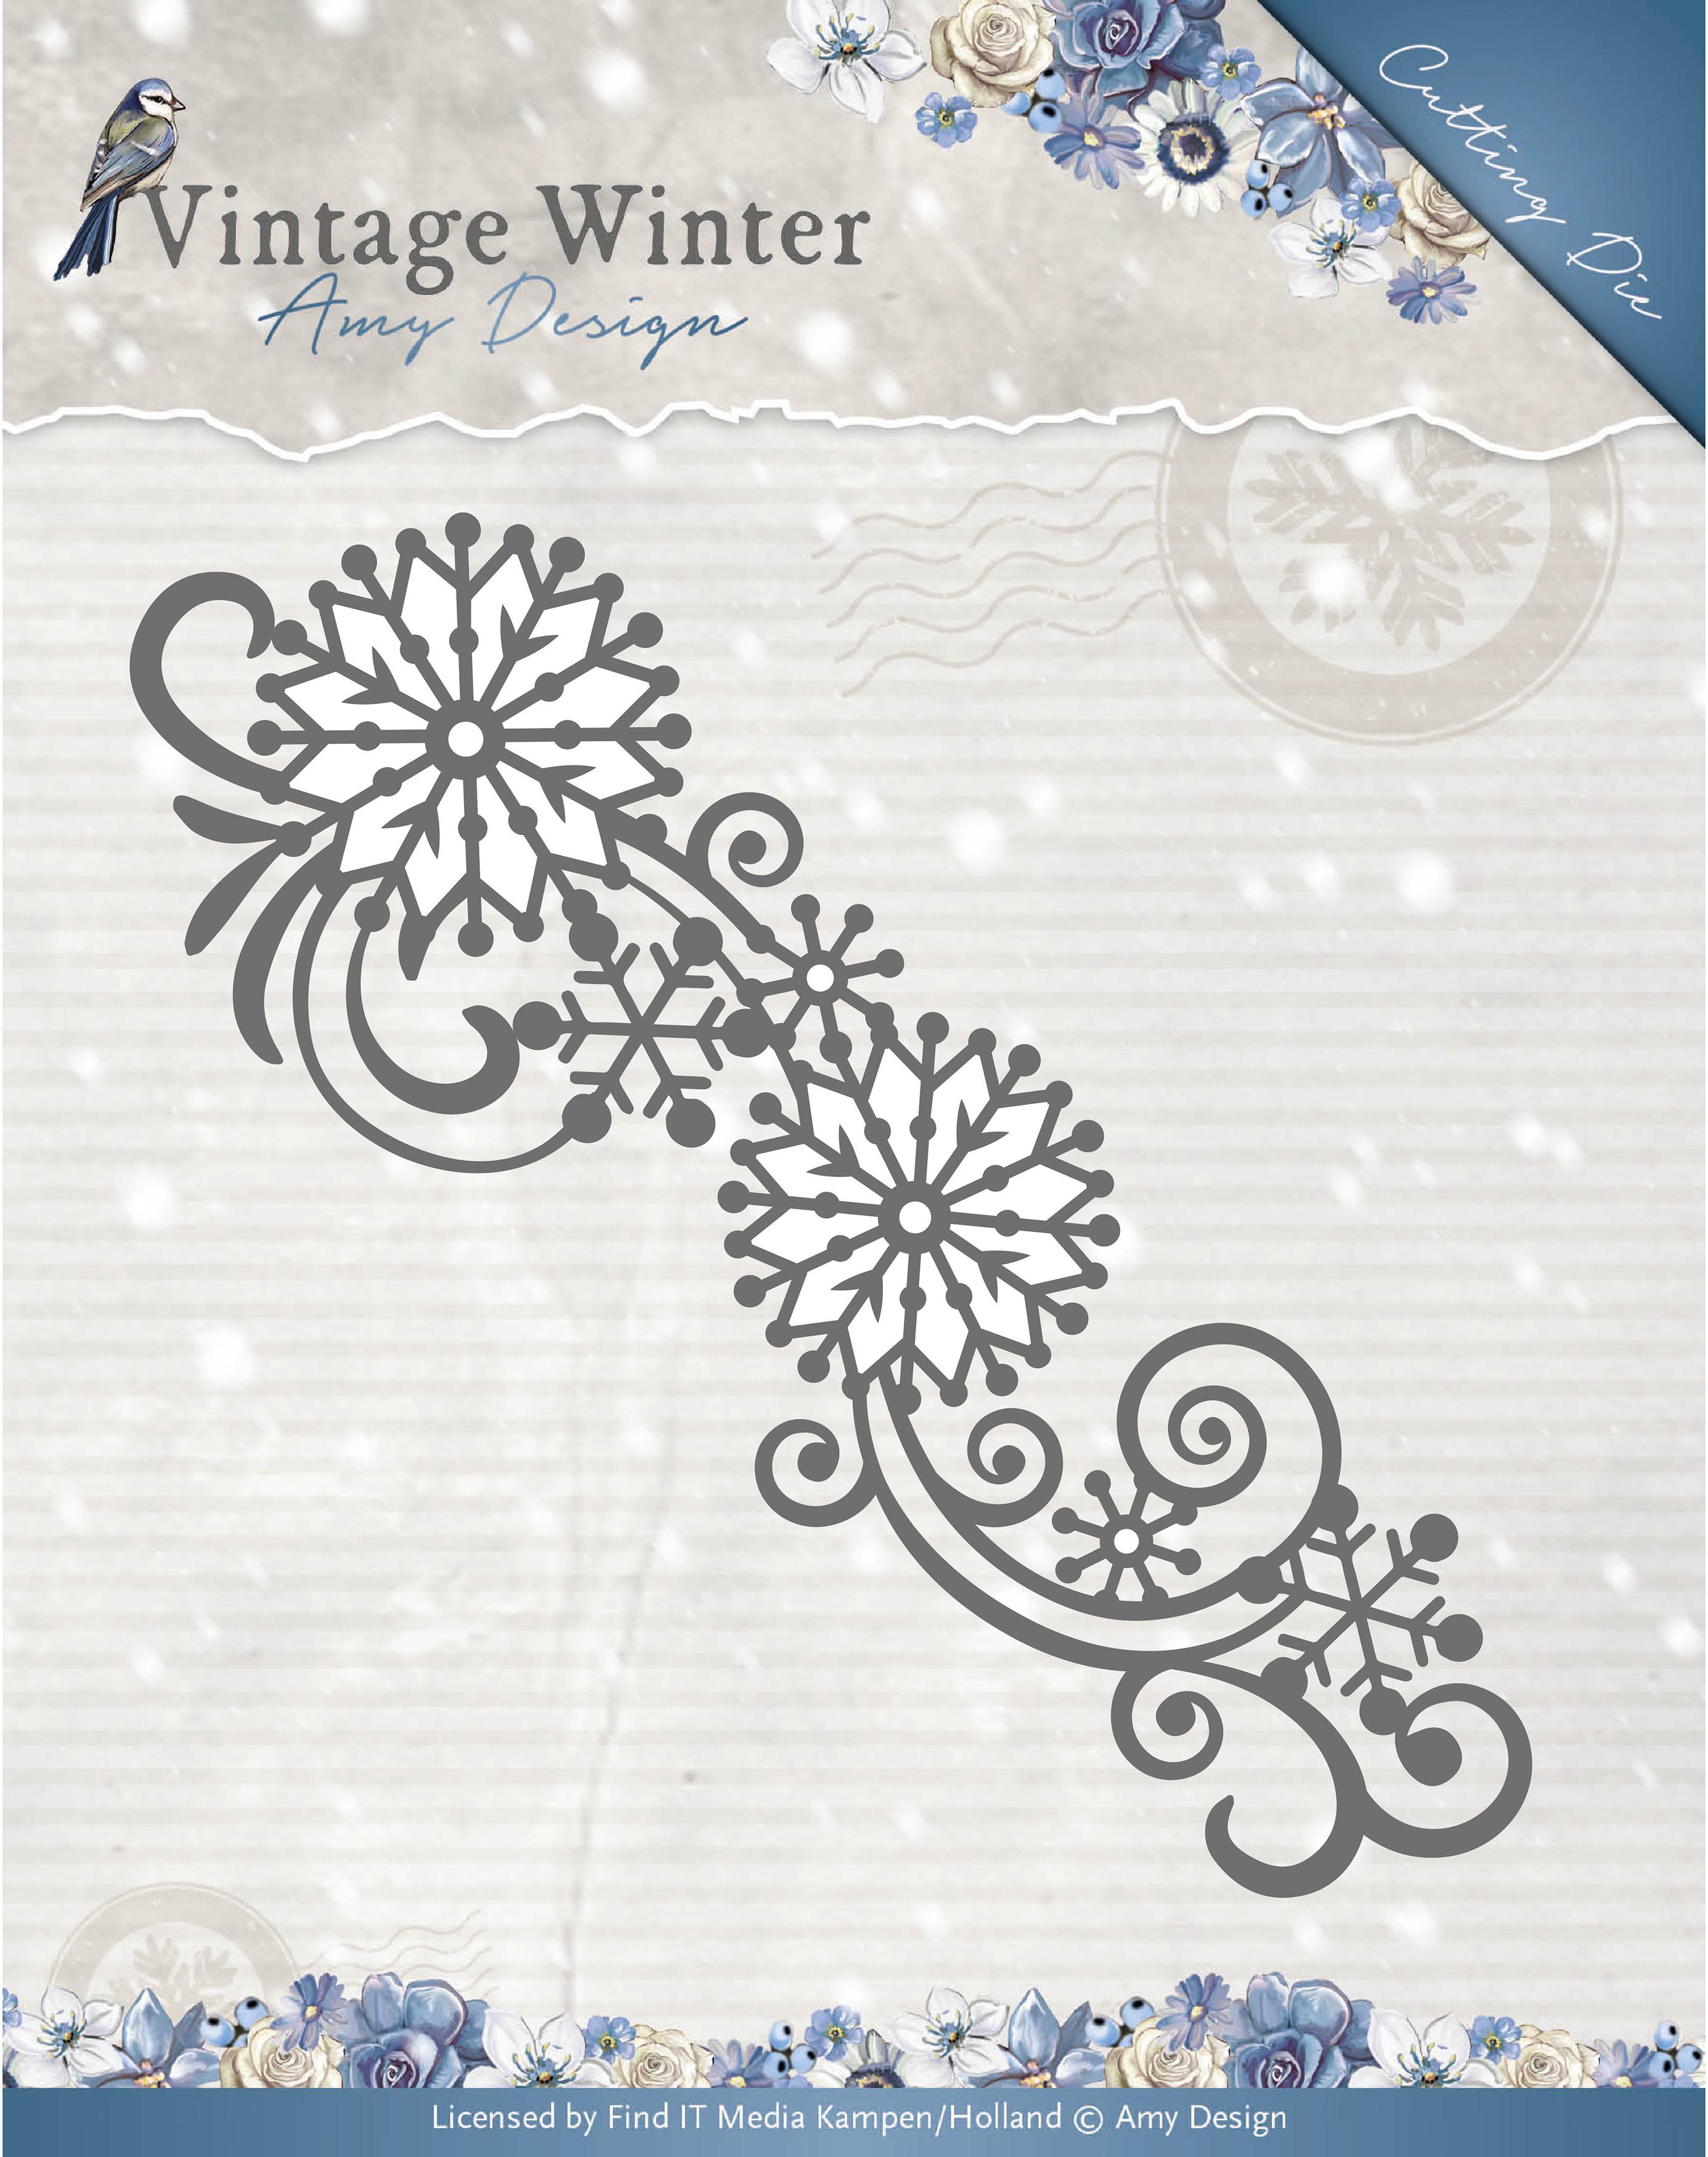 Snowflake Swirl Border - Find It Trading Amy Design Vintage Winter Die